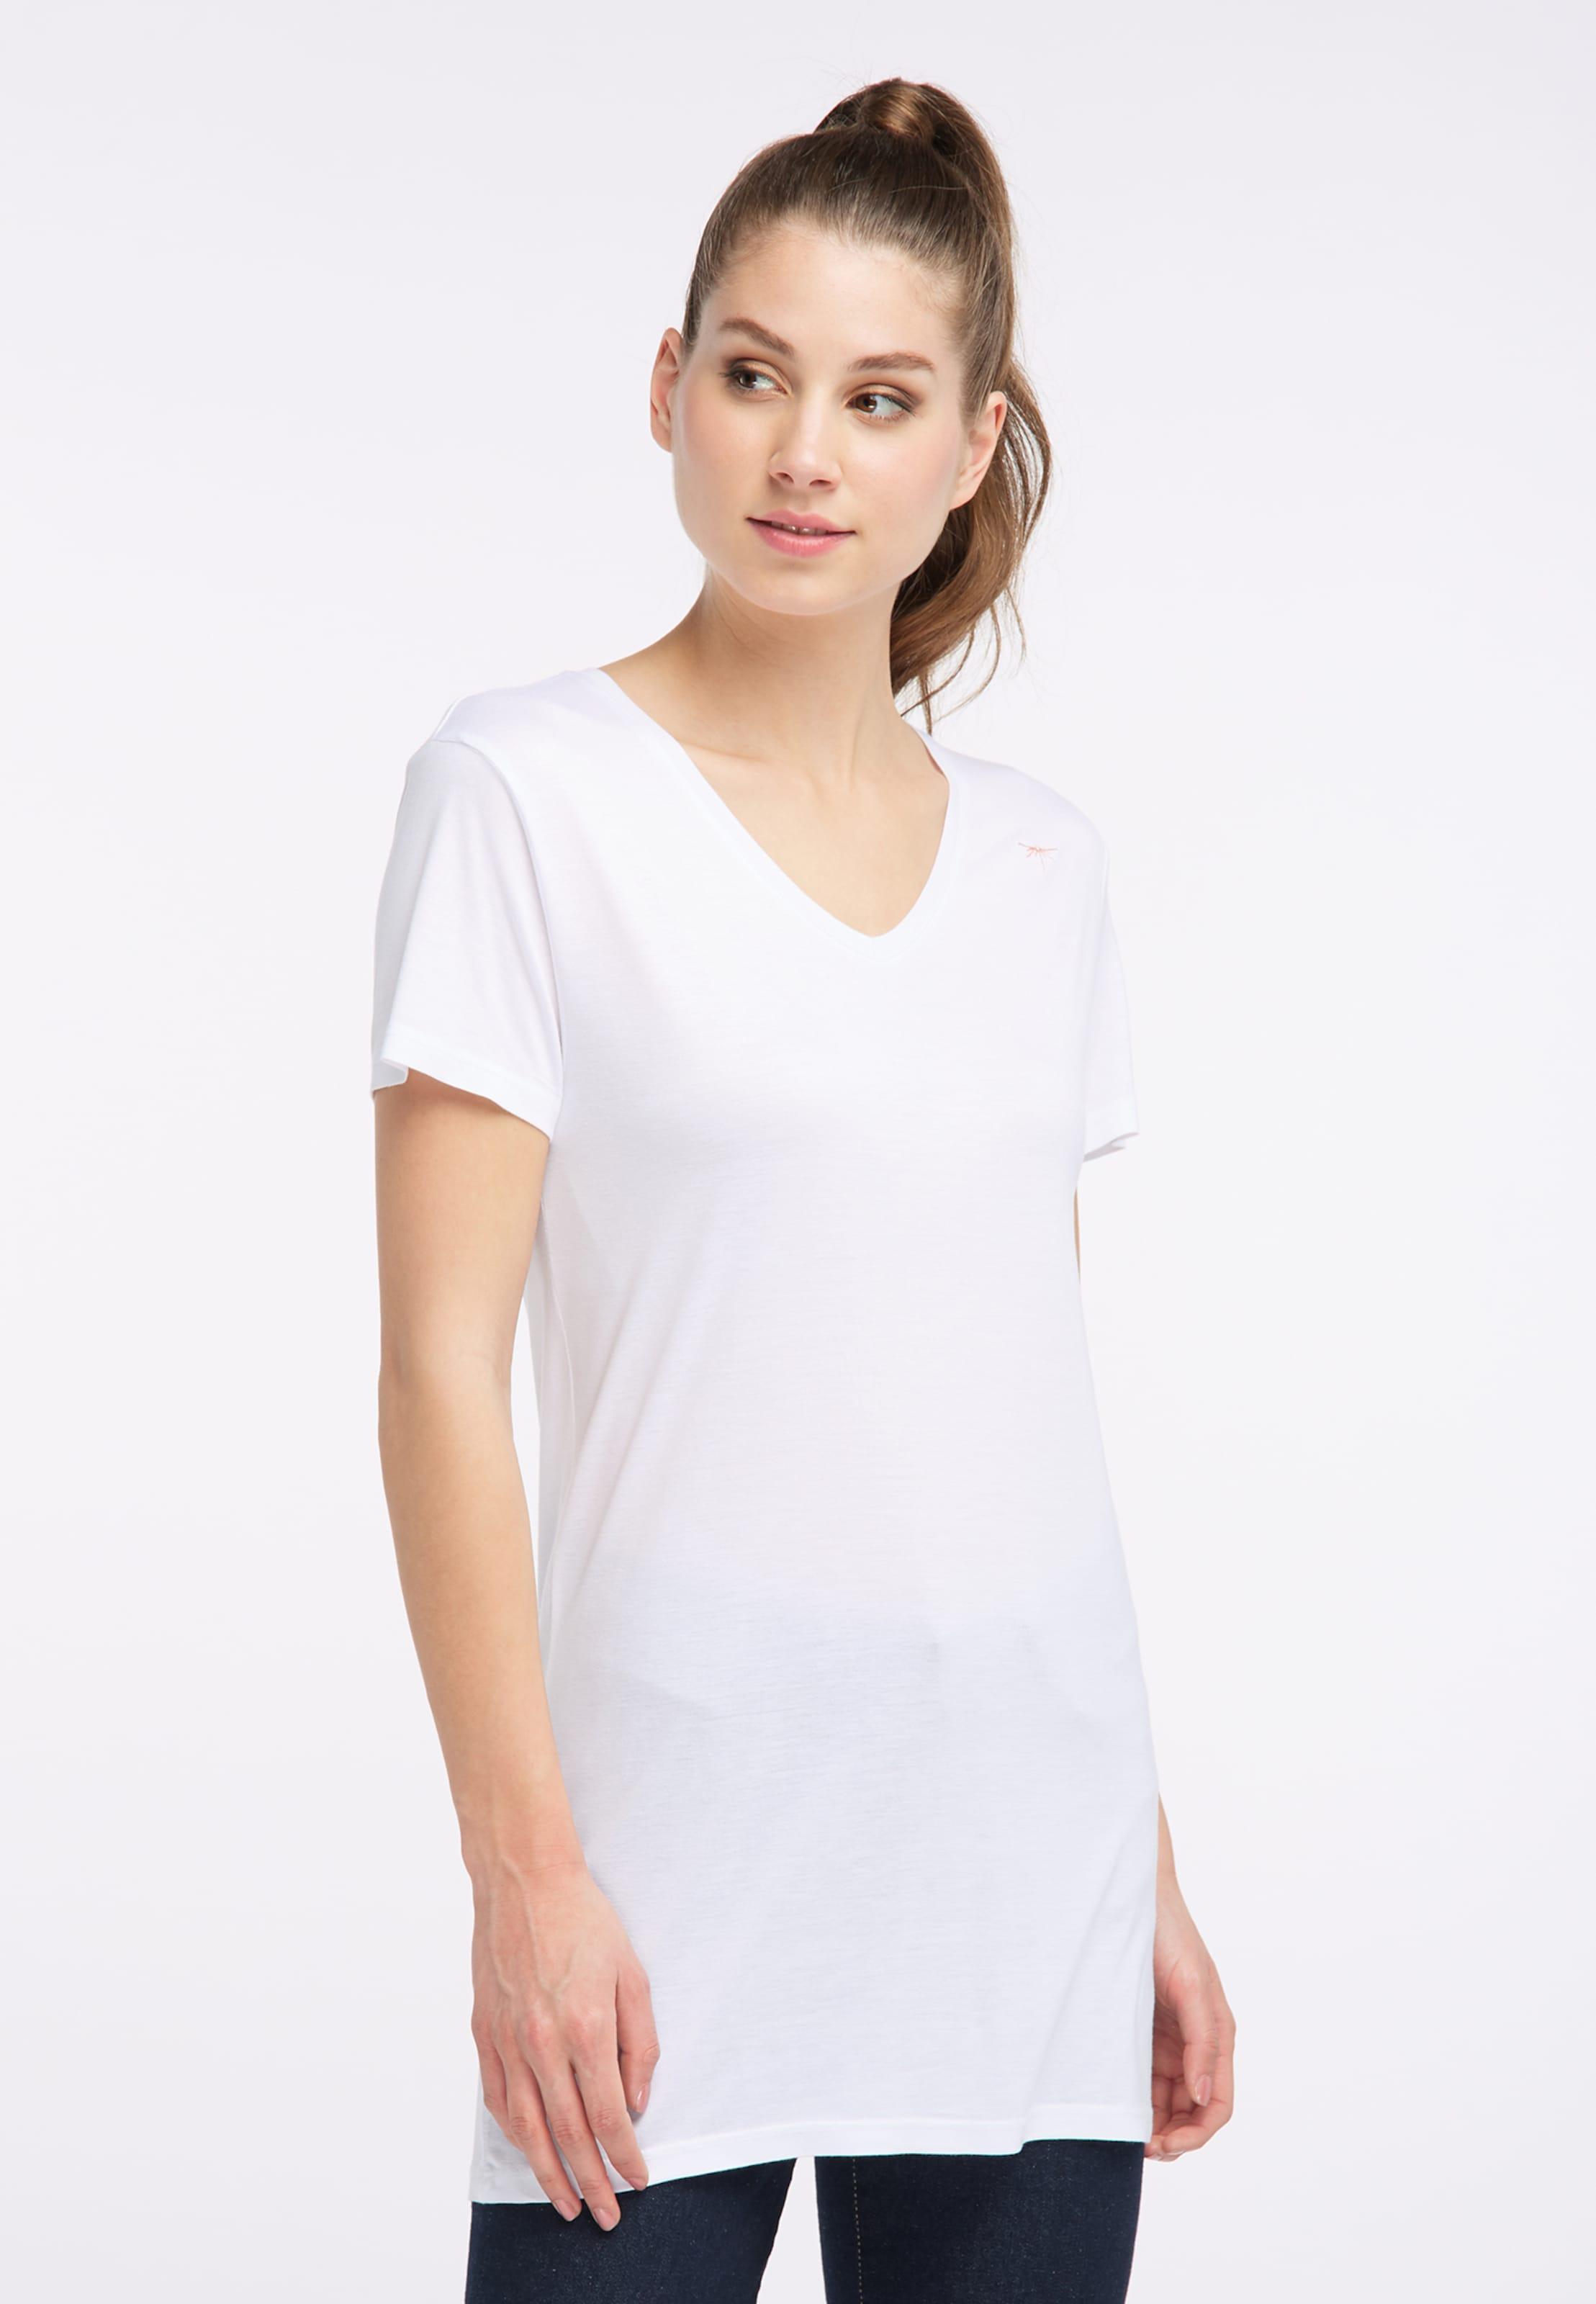 Shirt Weiß Petrol Shirt Industries Petrol In Industries In QBedCorxWE